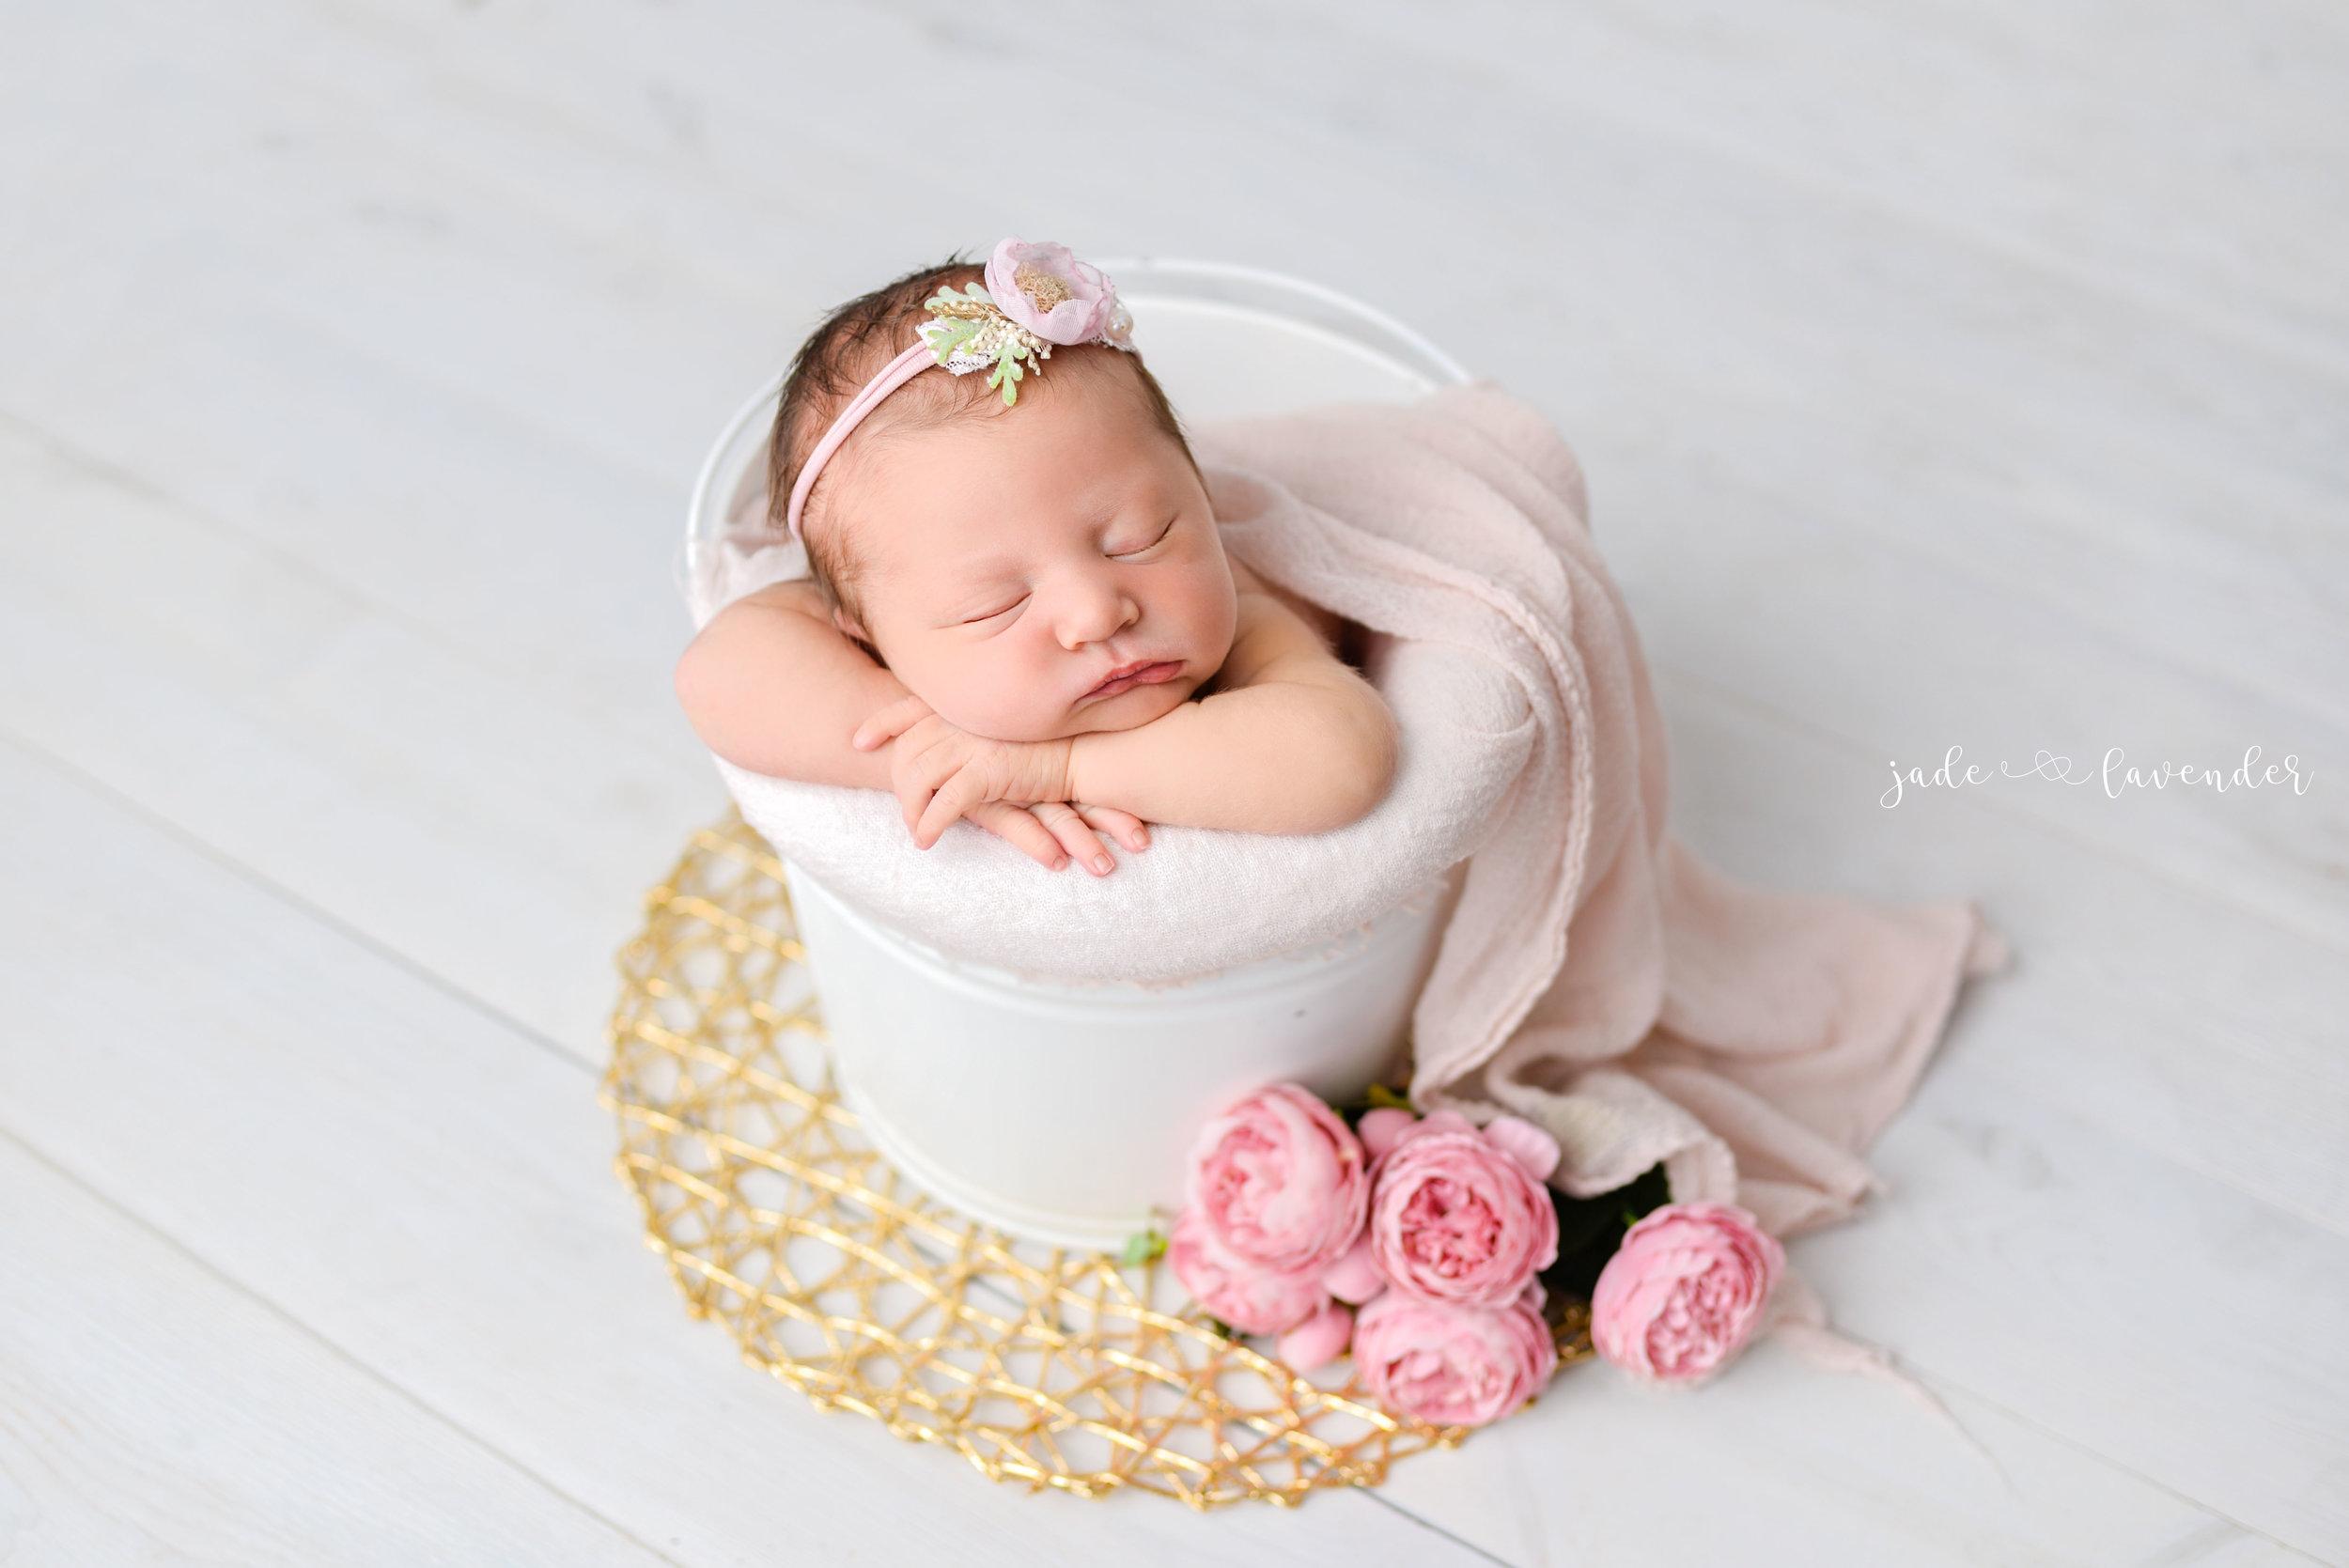 Baby-girl-pink-newborn-photography-infant-images-baby-photos-photographer-spokane-washington (8 of 8).jpg